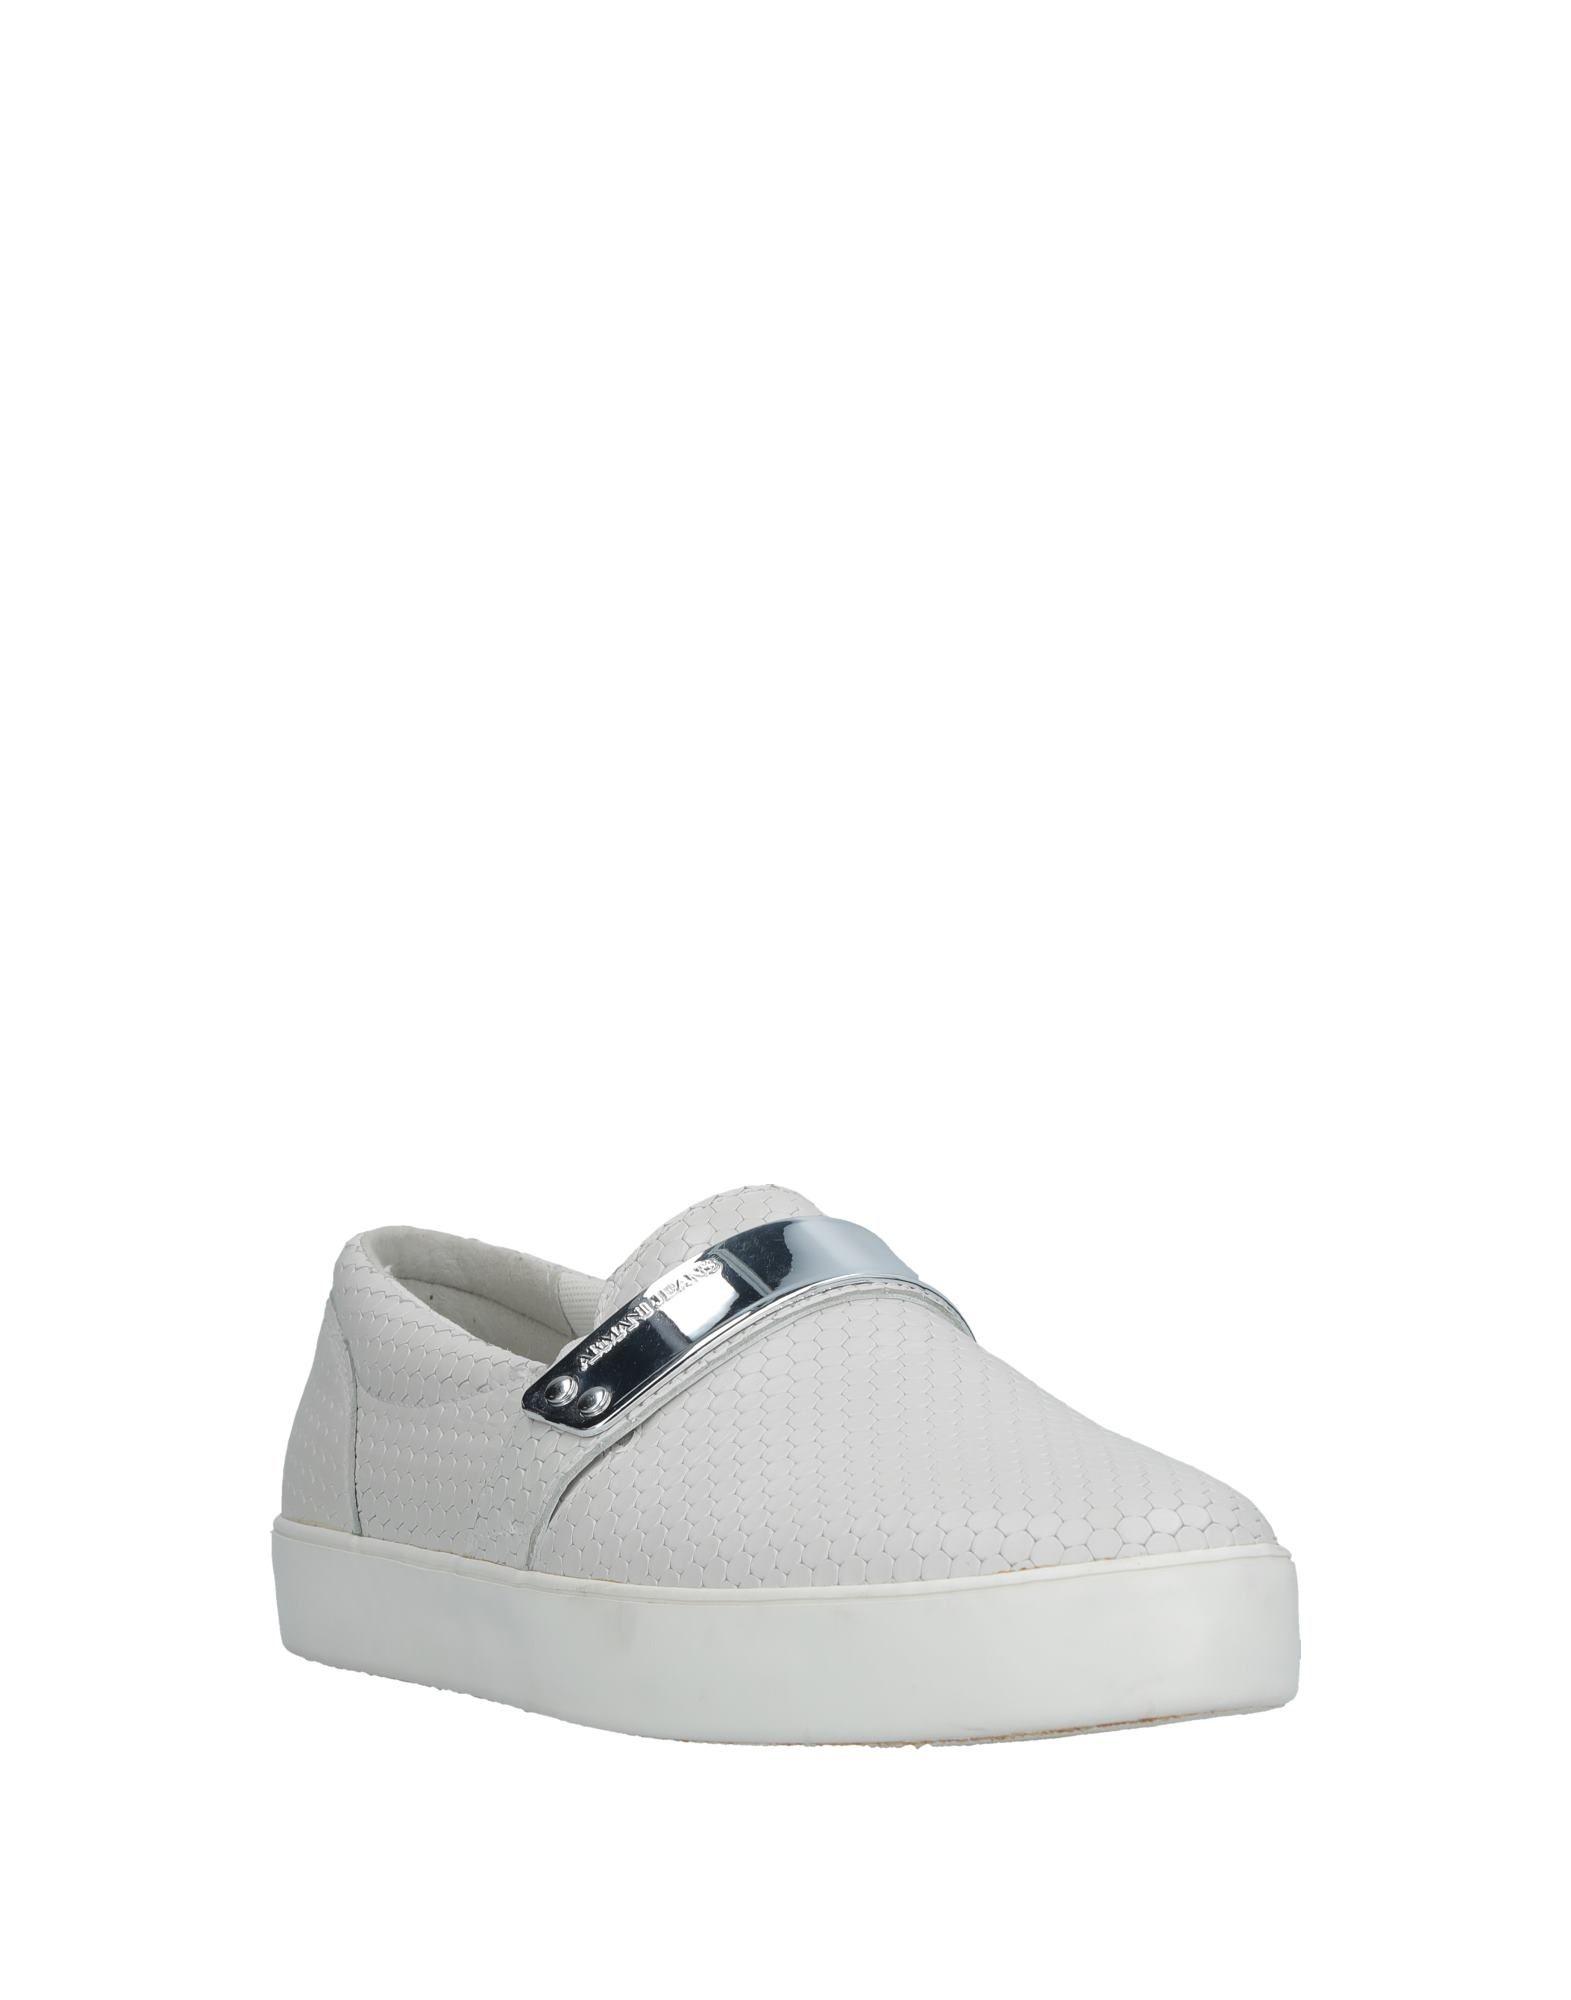 Armani Jeans  Sneakers Herren  Jeans 11524243BO 8af644